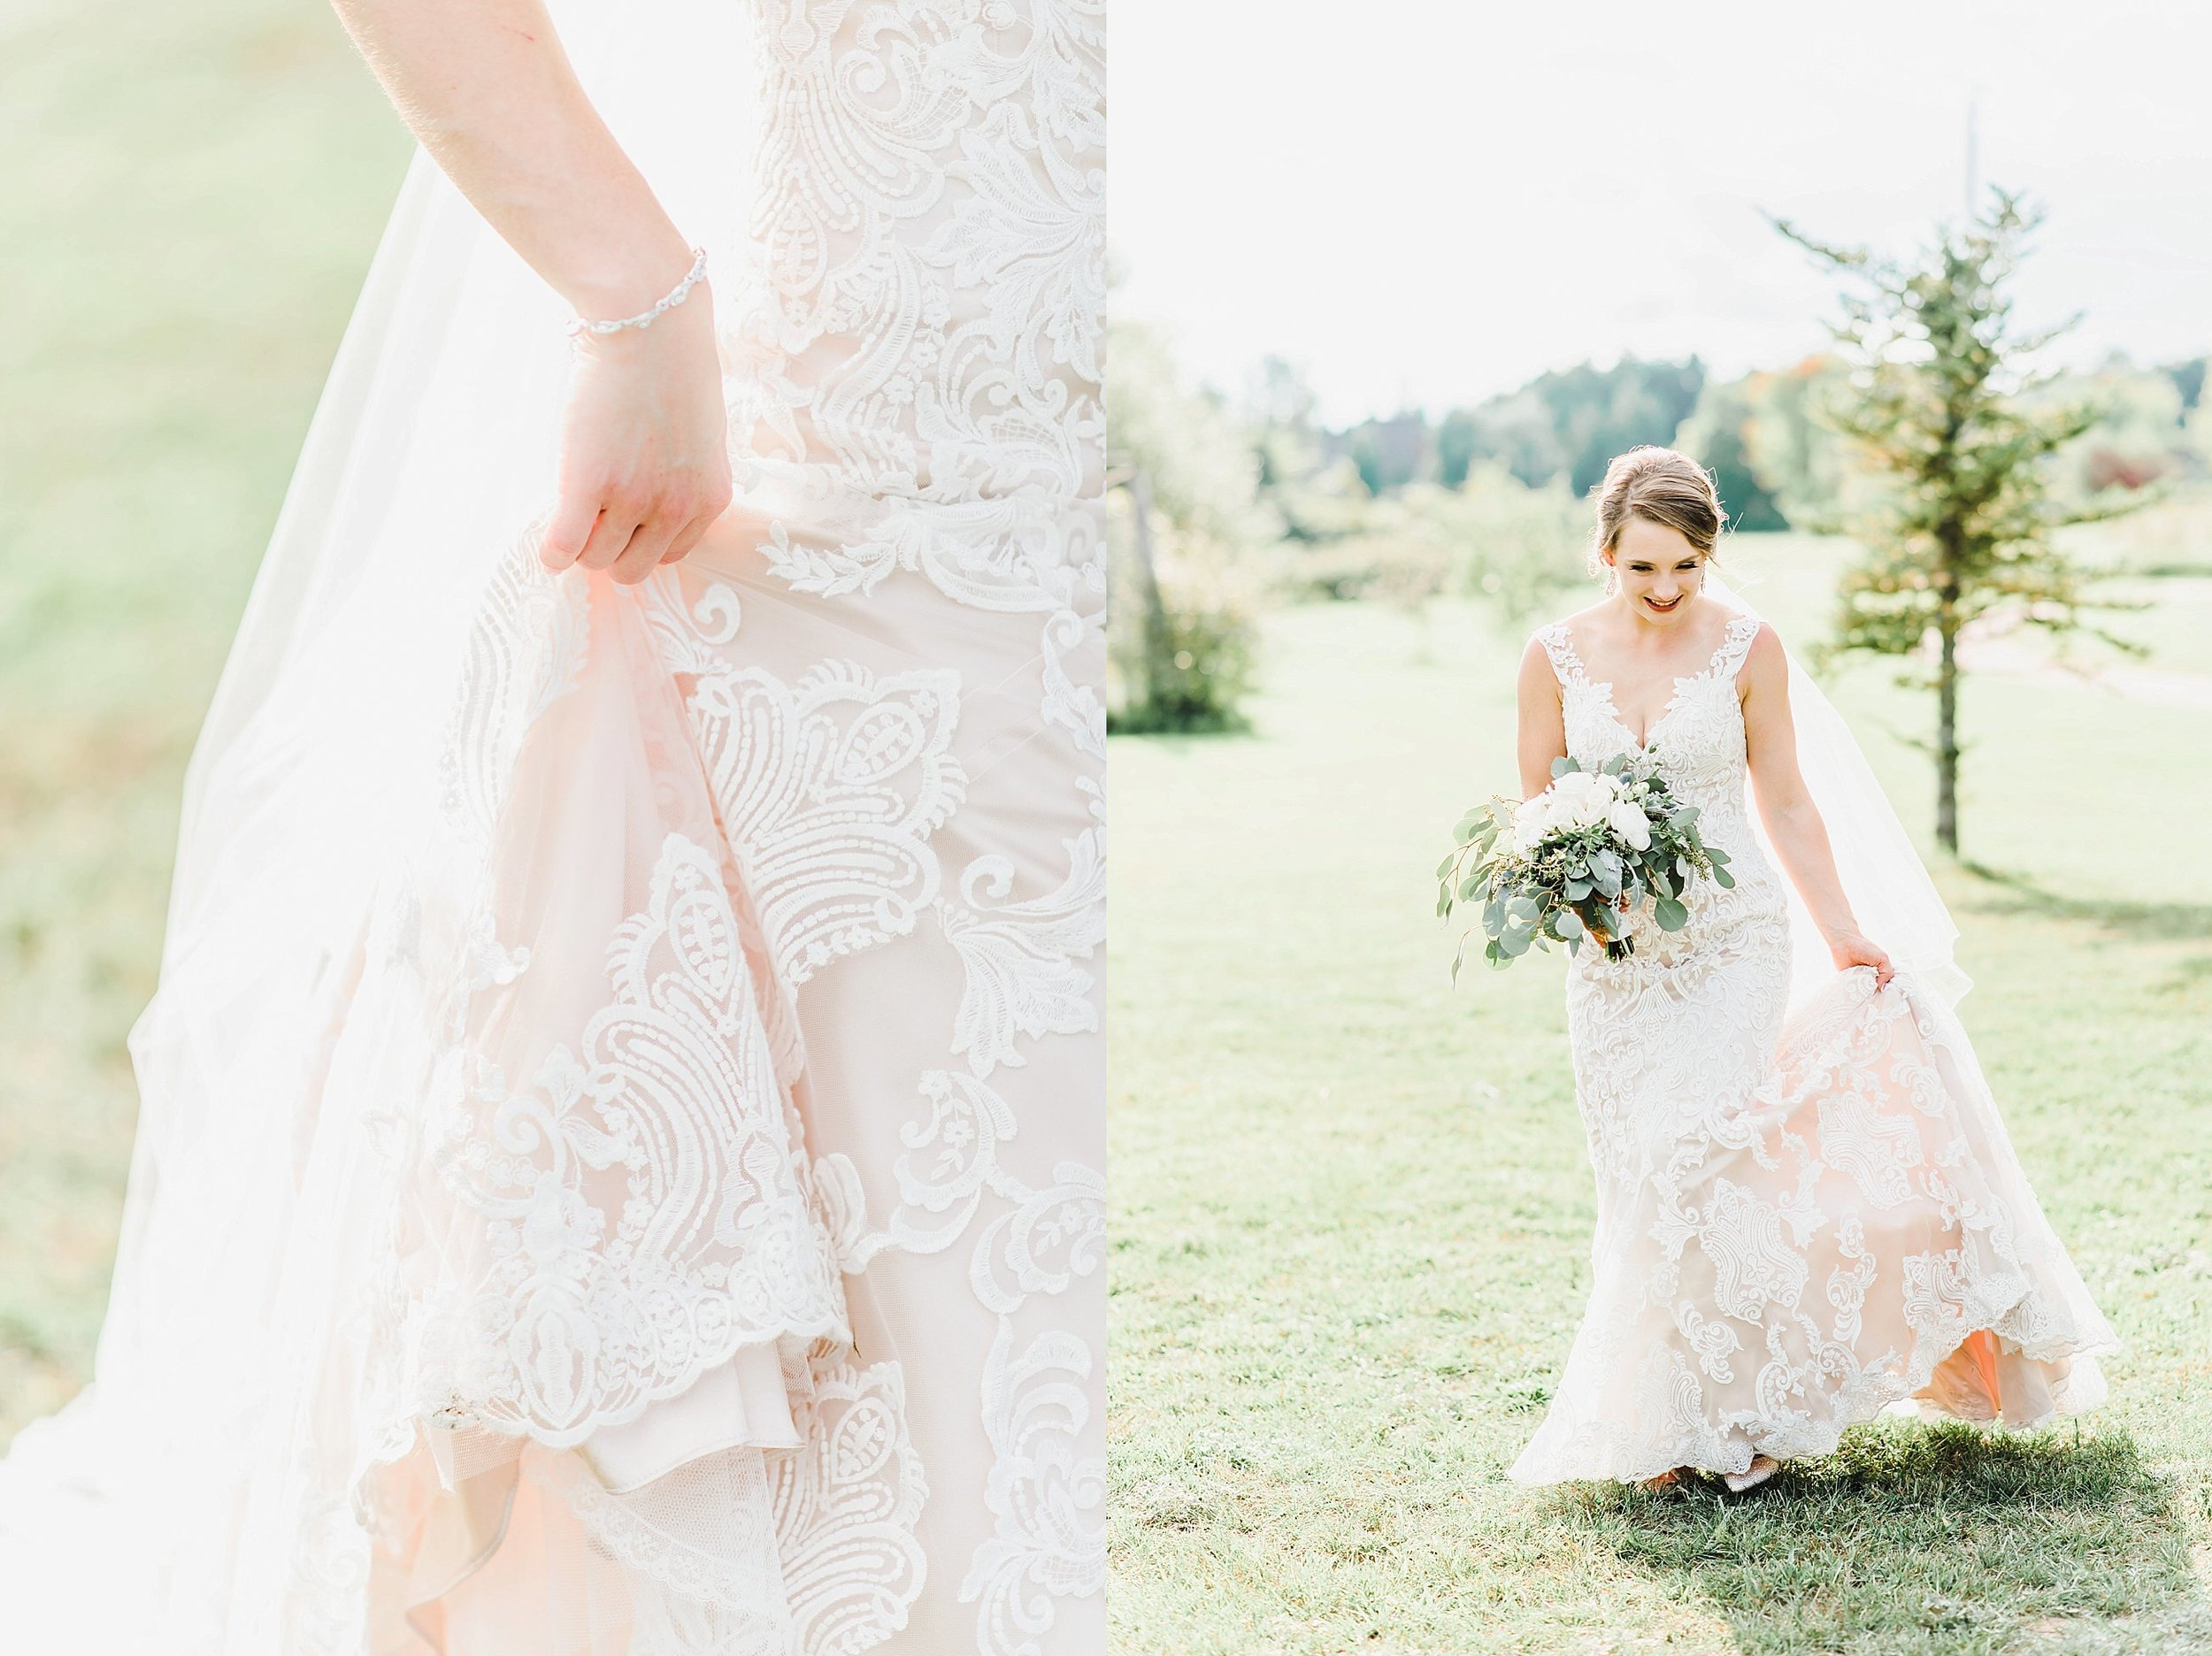 light airy indie fine art ottawa wedding photographer | Ali and Batoul Photography_1324.jpg